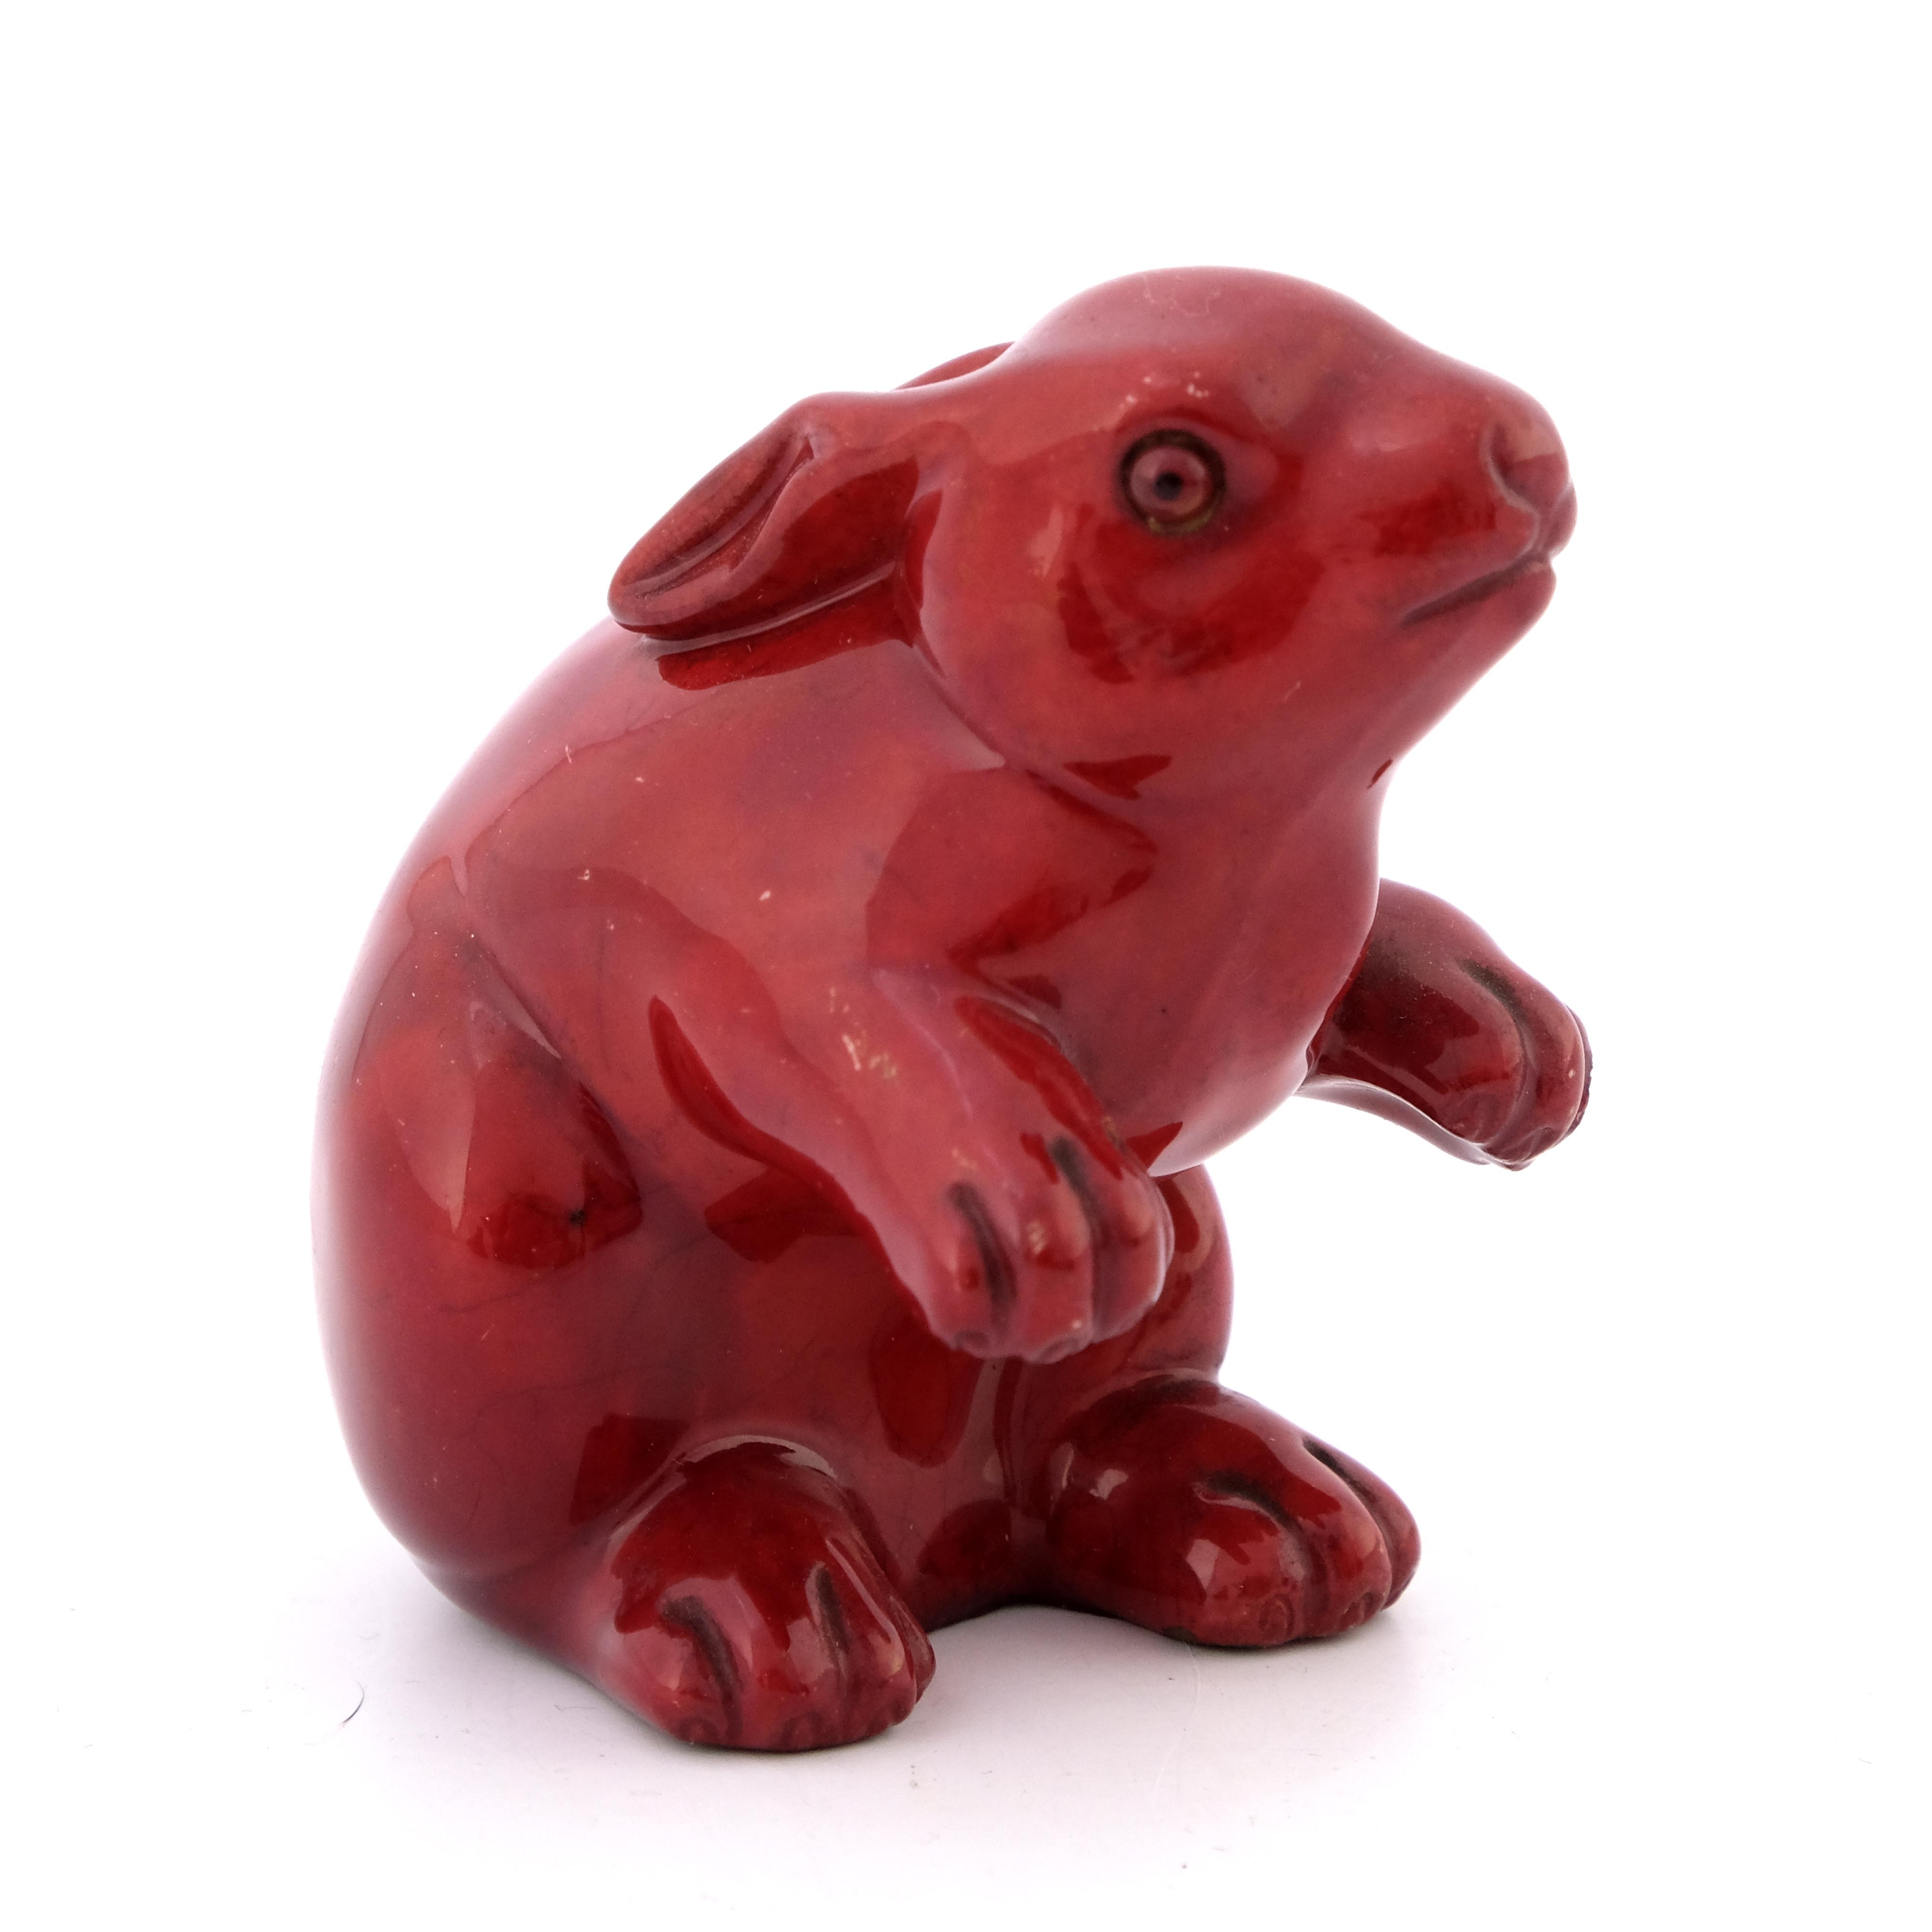 Bernard Moore, a flambe figure of a rabbit